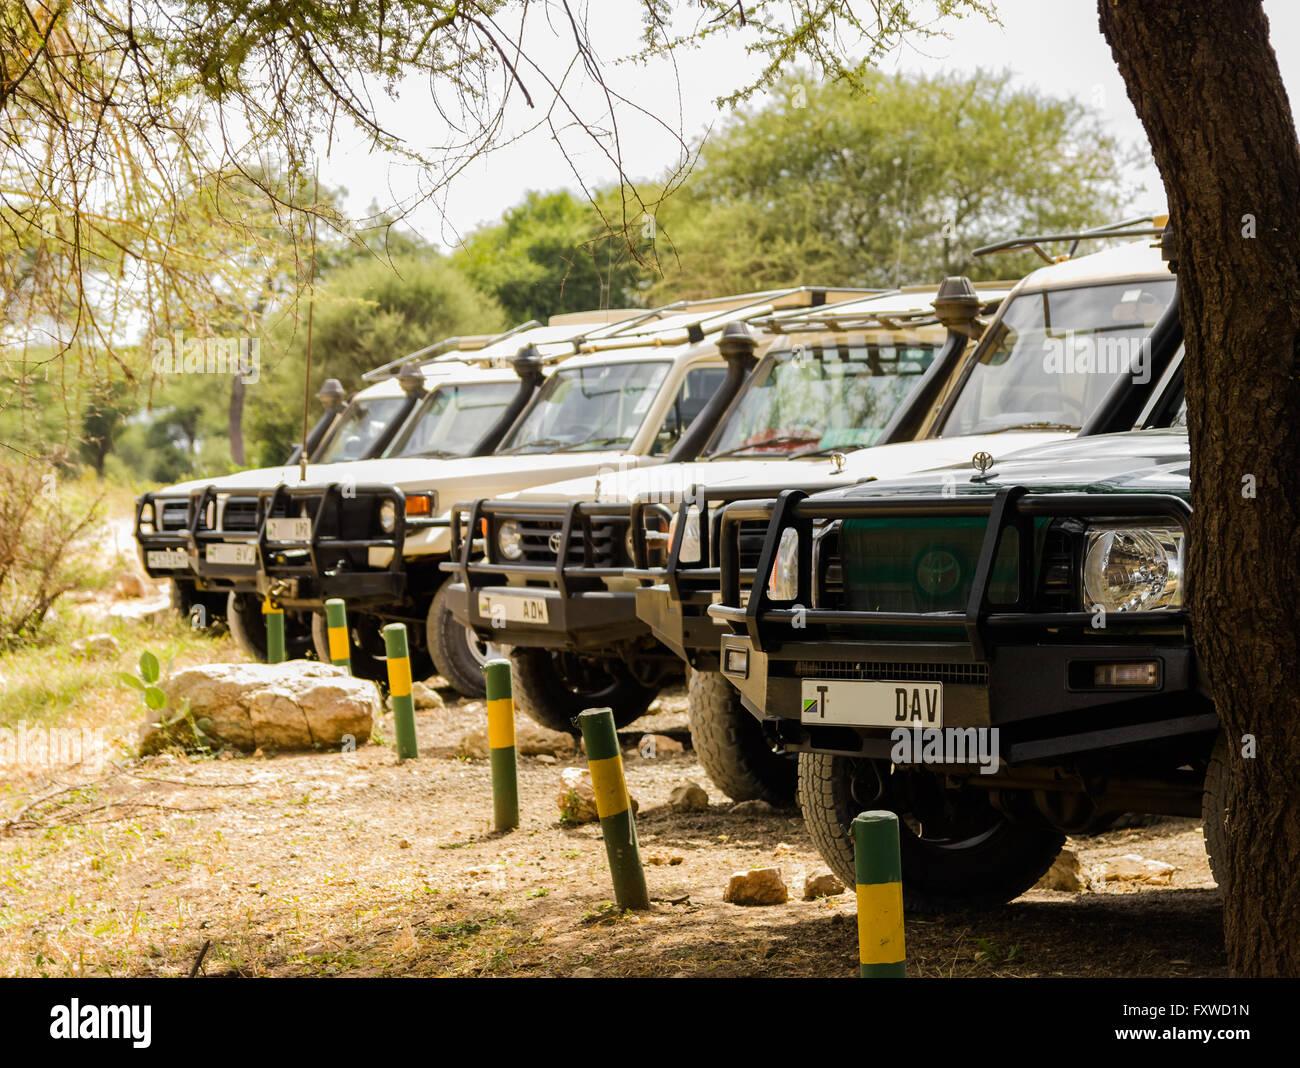 Safari vehicles parking at Main Entrance Gate, Tarangire National Park, Tanzania - Stock Image